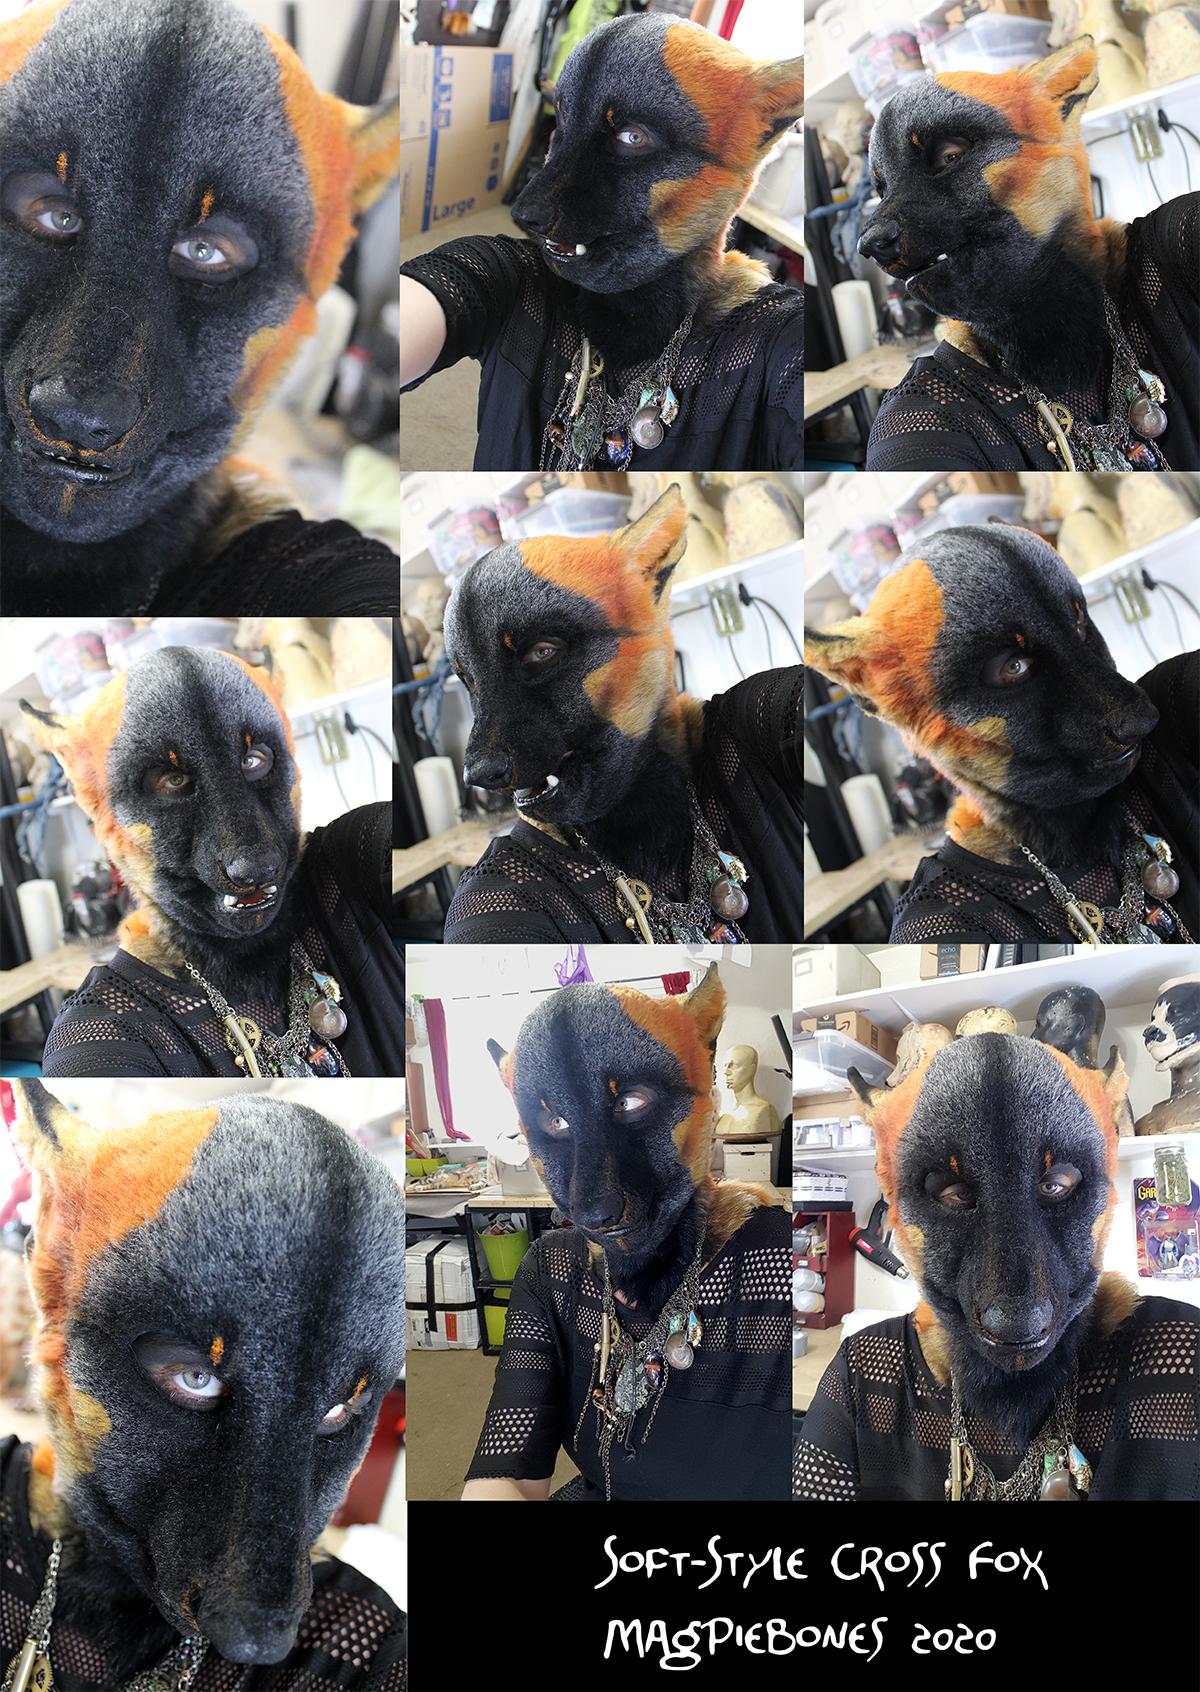 Soft Style Cross Fox